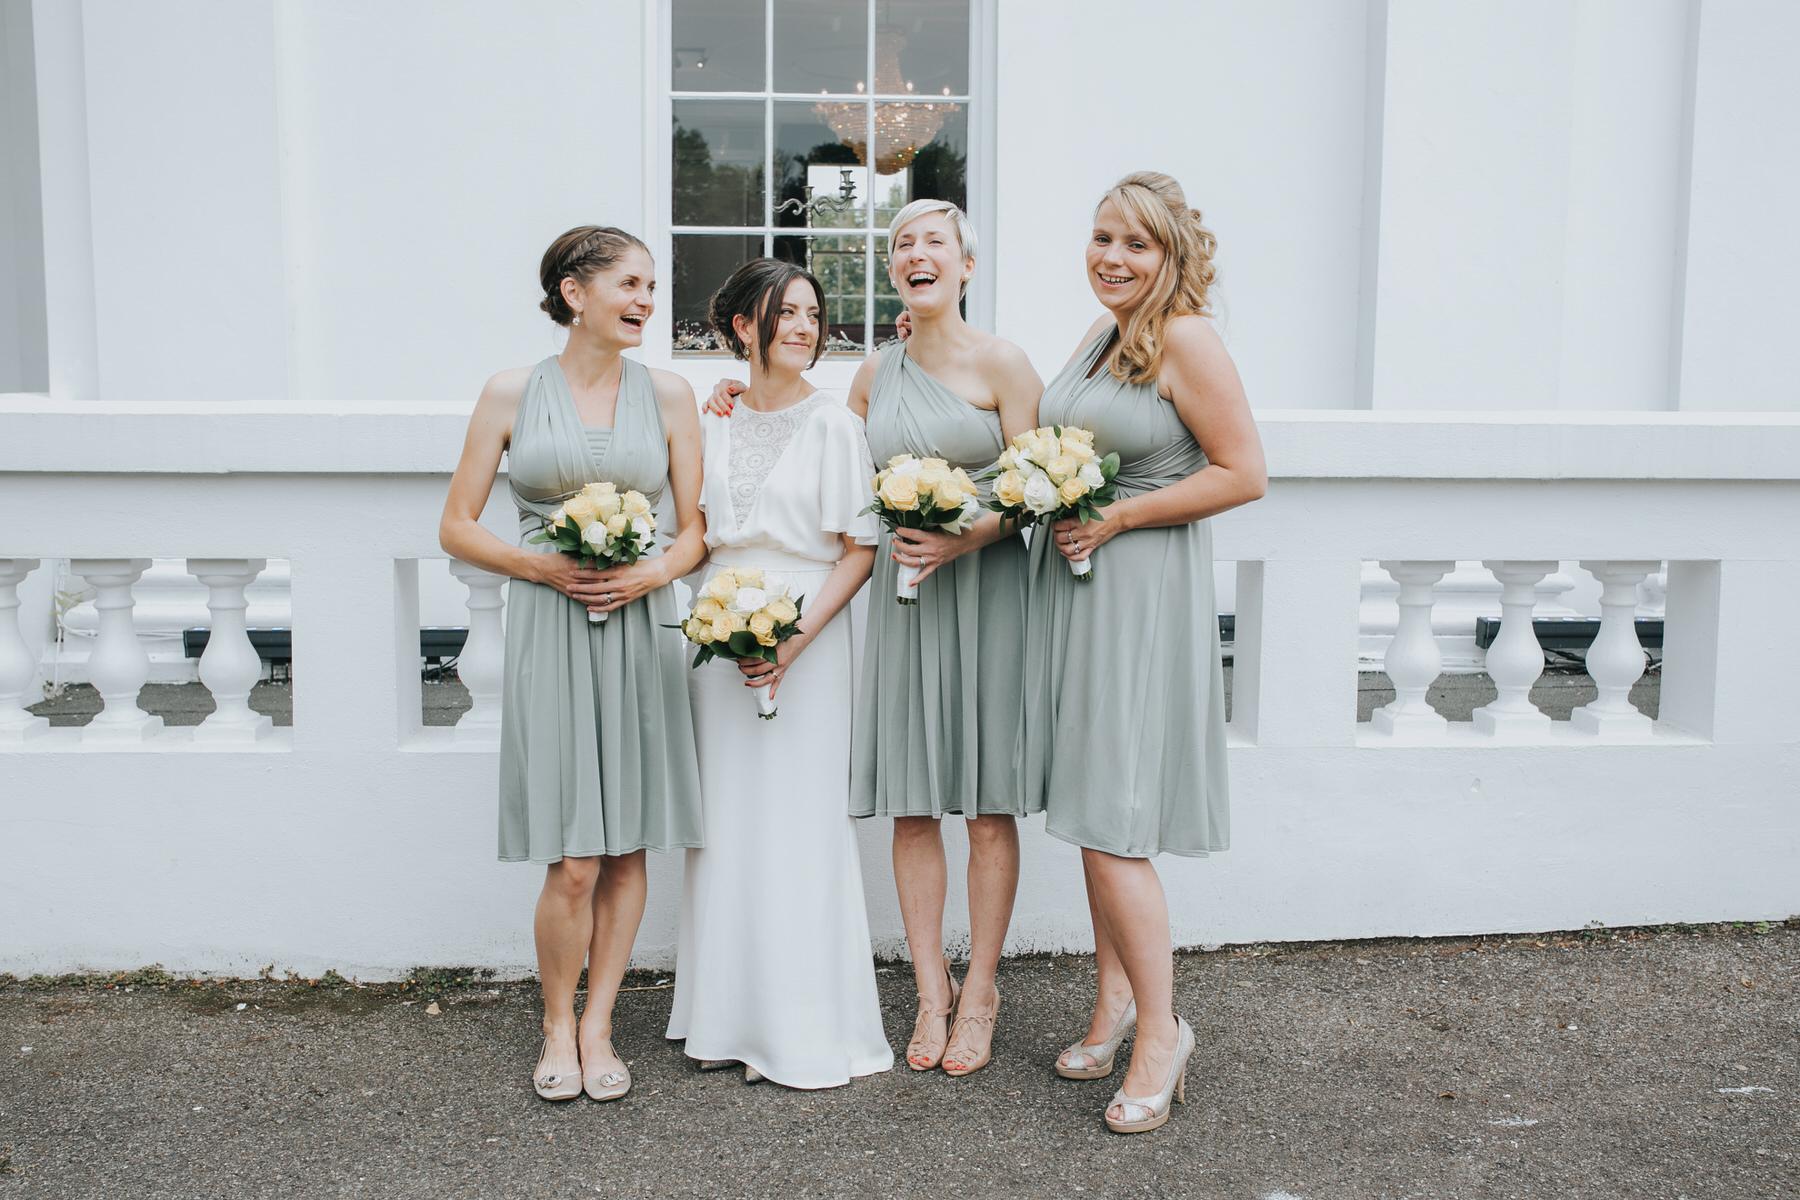 220 Amy bridesmaids wedding reportage photographer.jpg